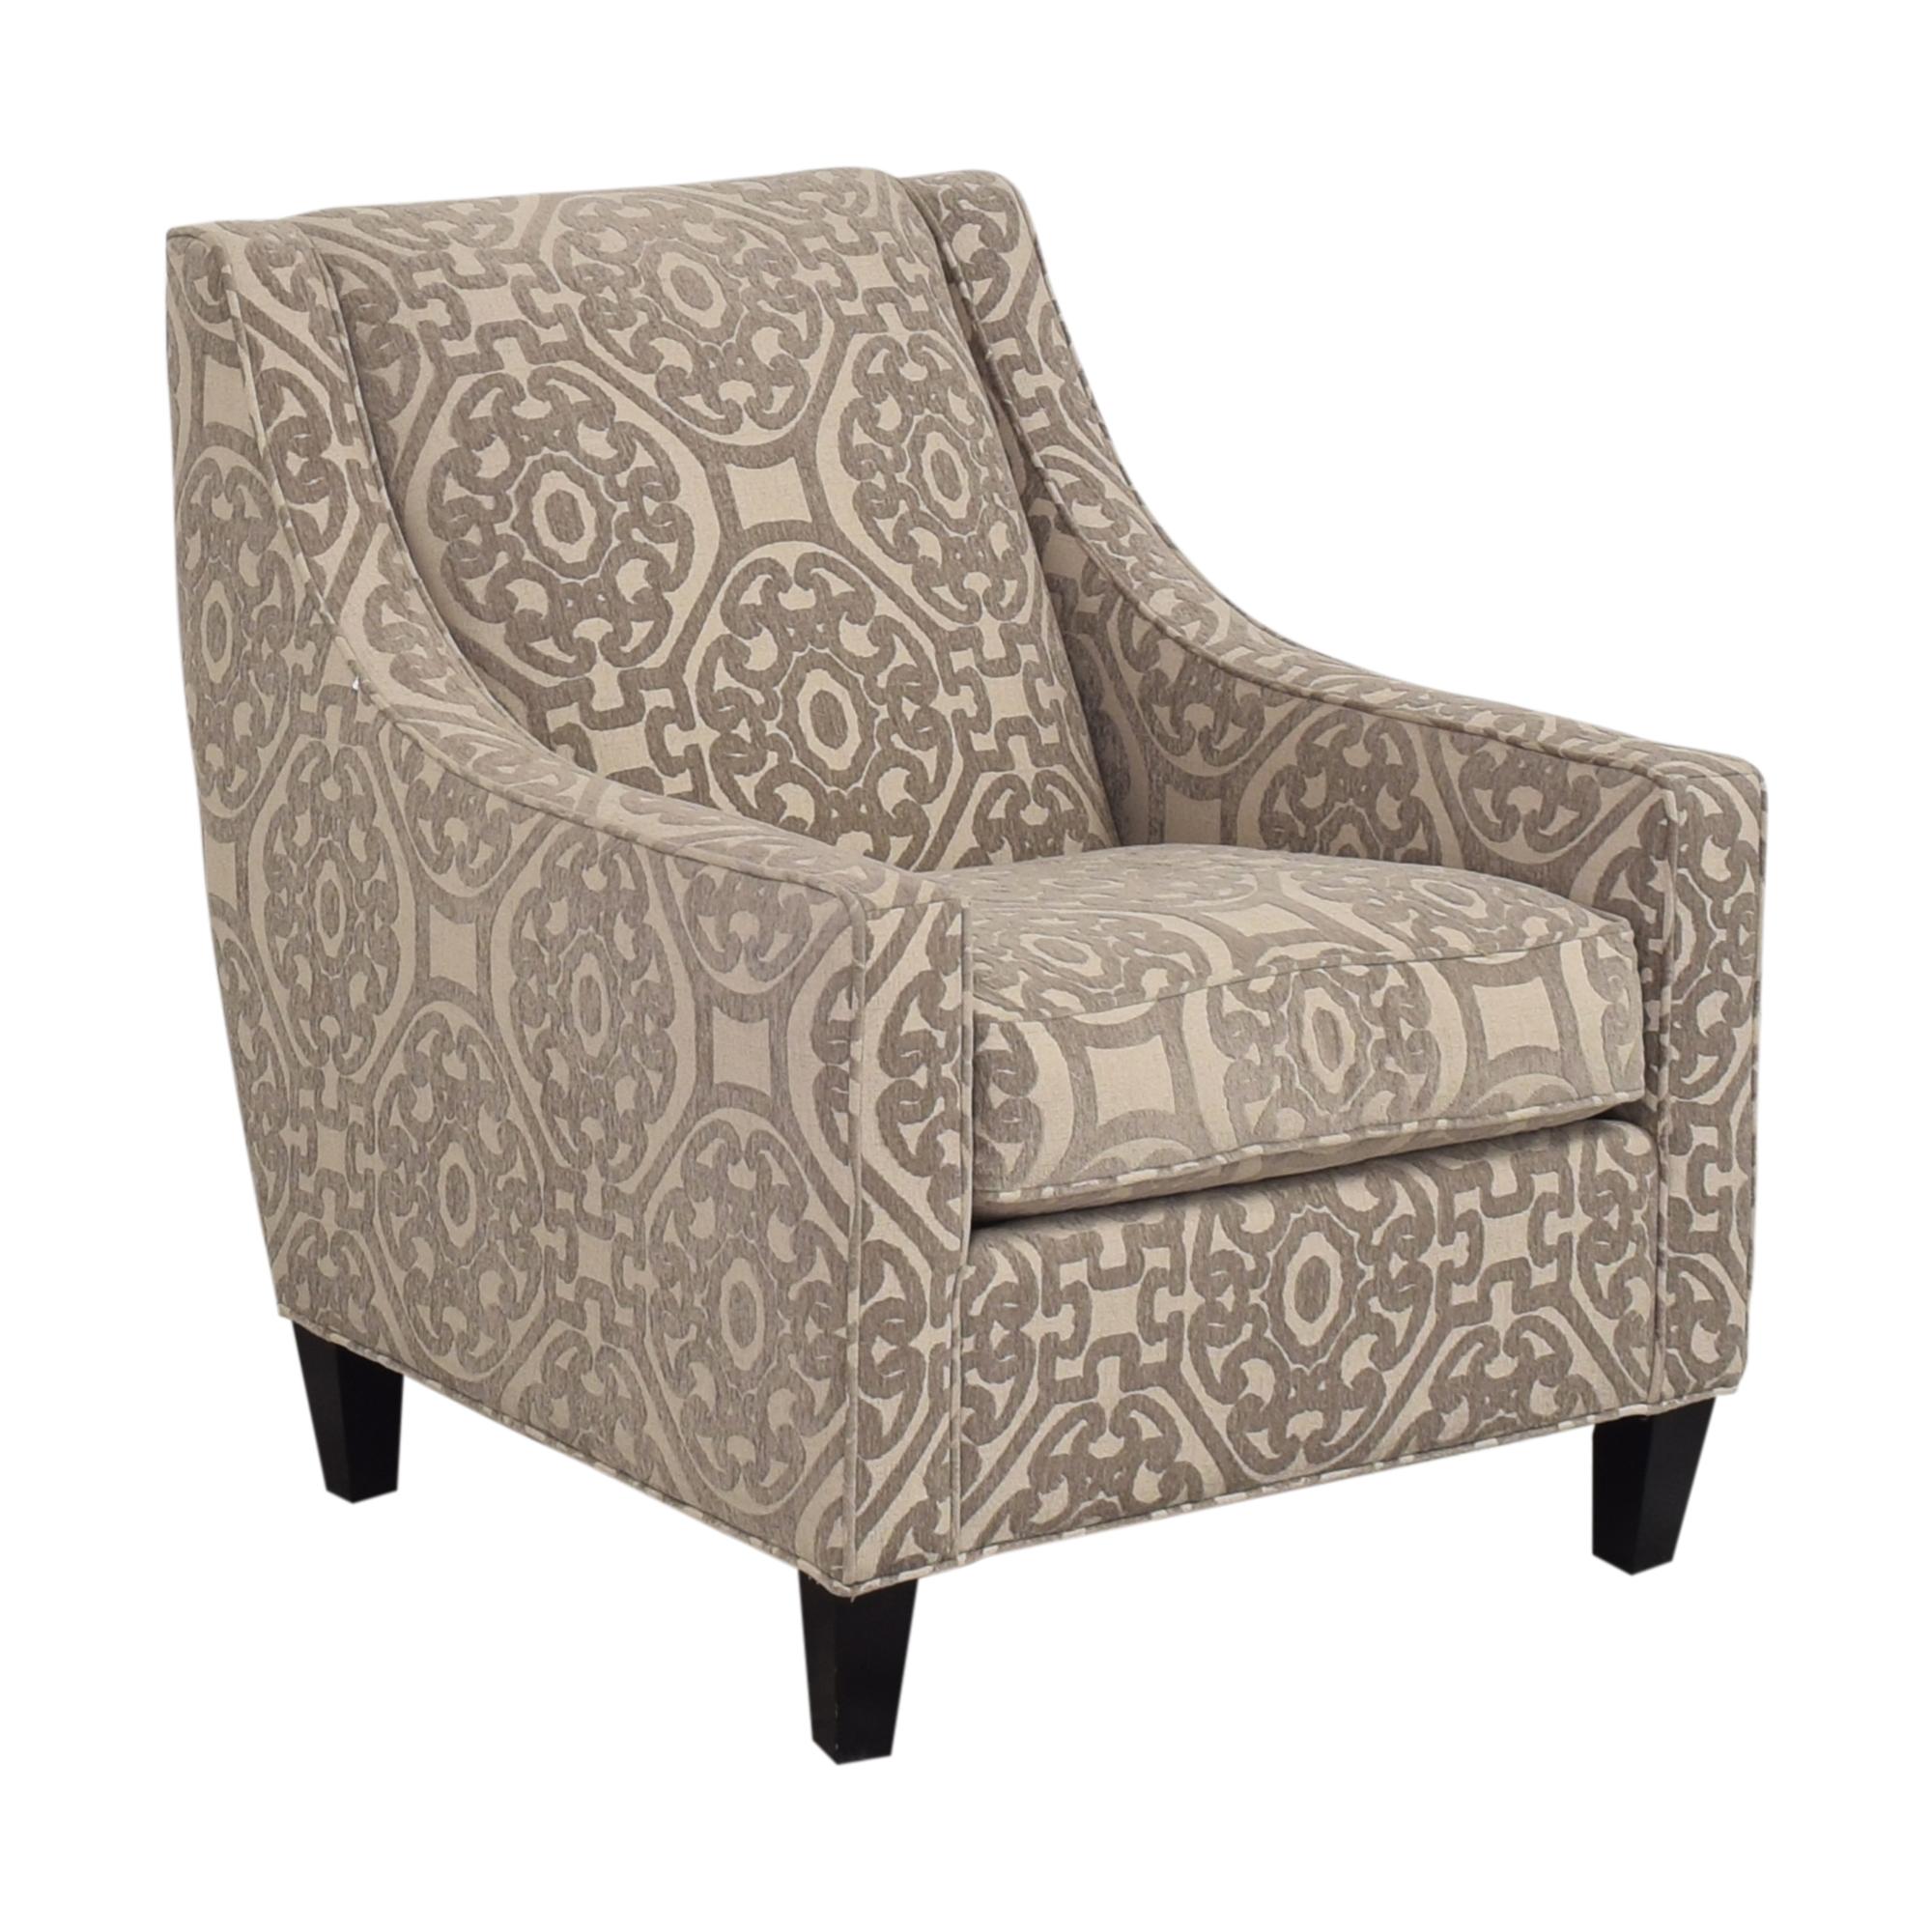 Raymour & Flanigan Raymour & Flanigan Cindy Crawford Home Calista Chair on sale